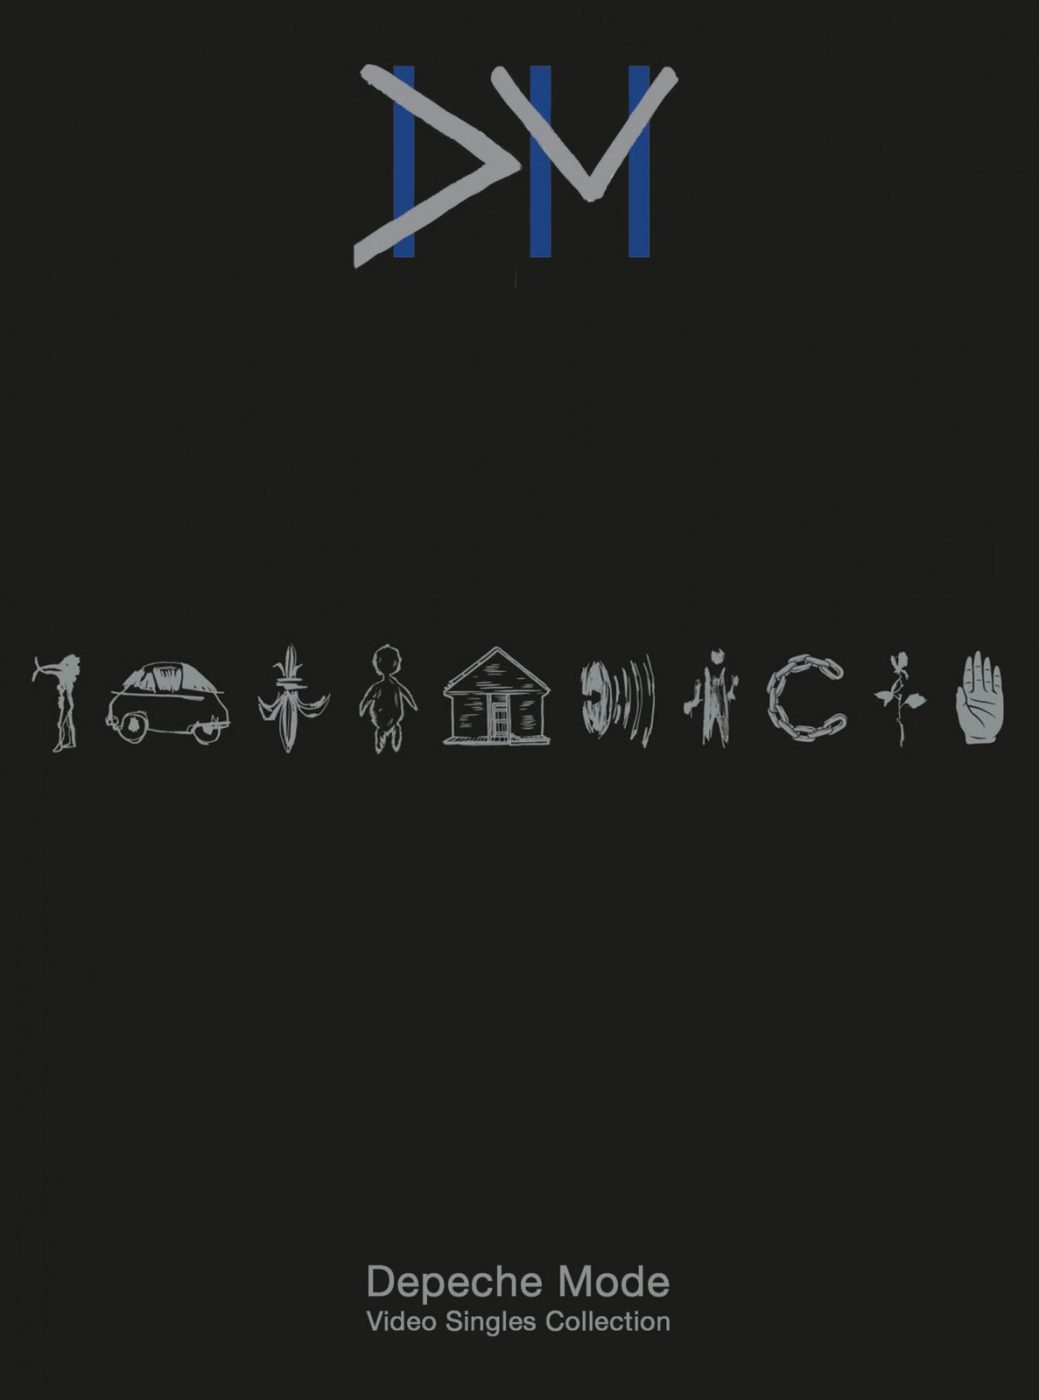 dm-dvd-cover-final